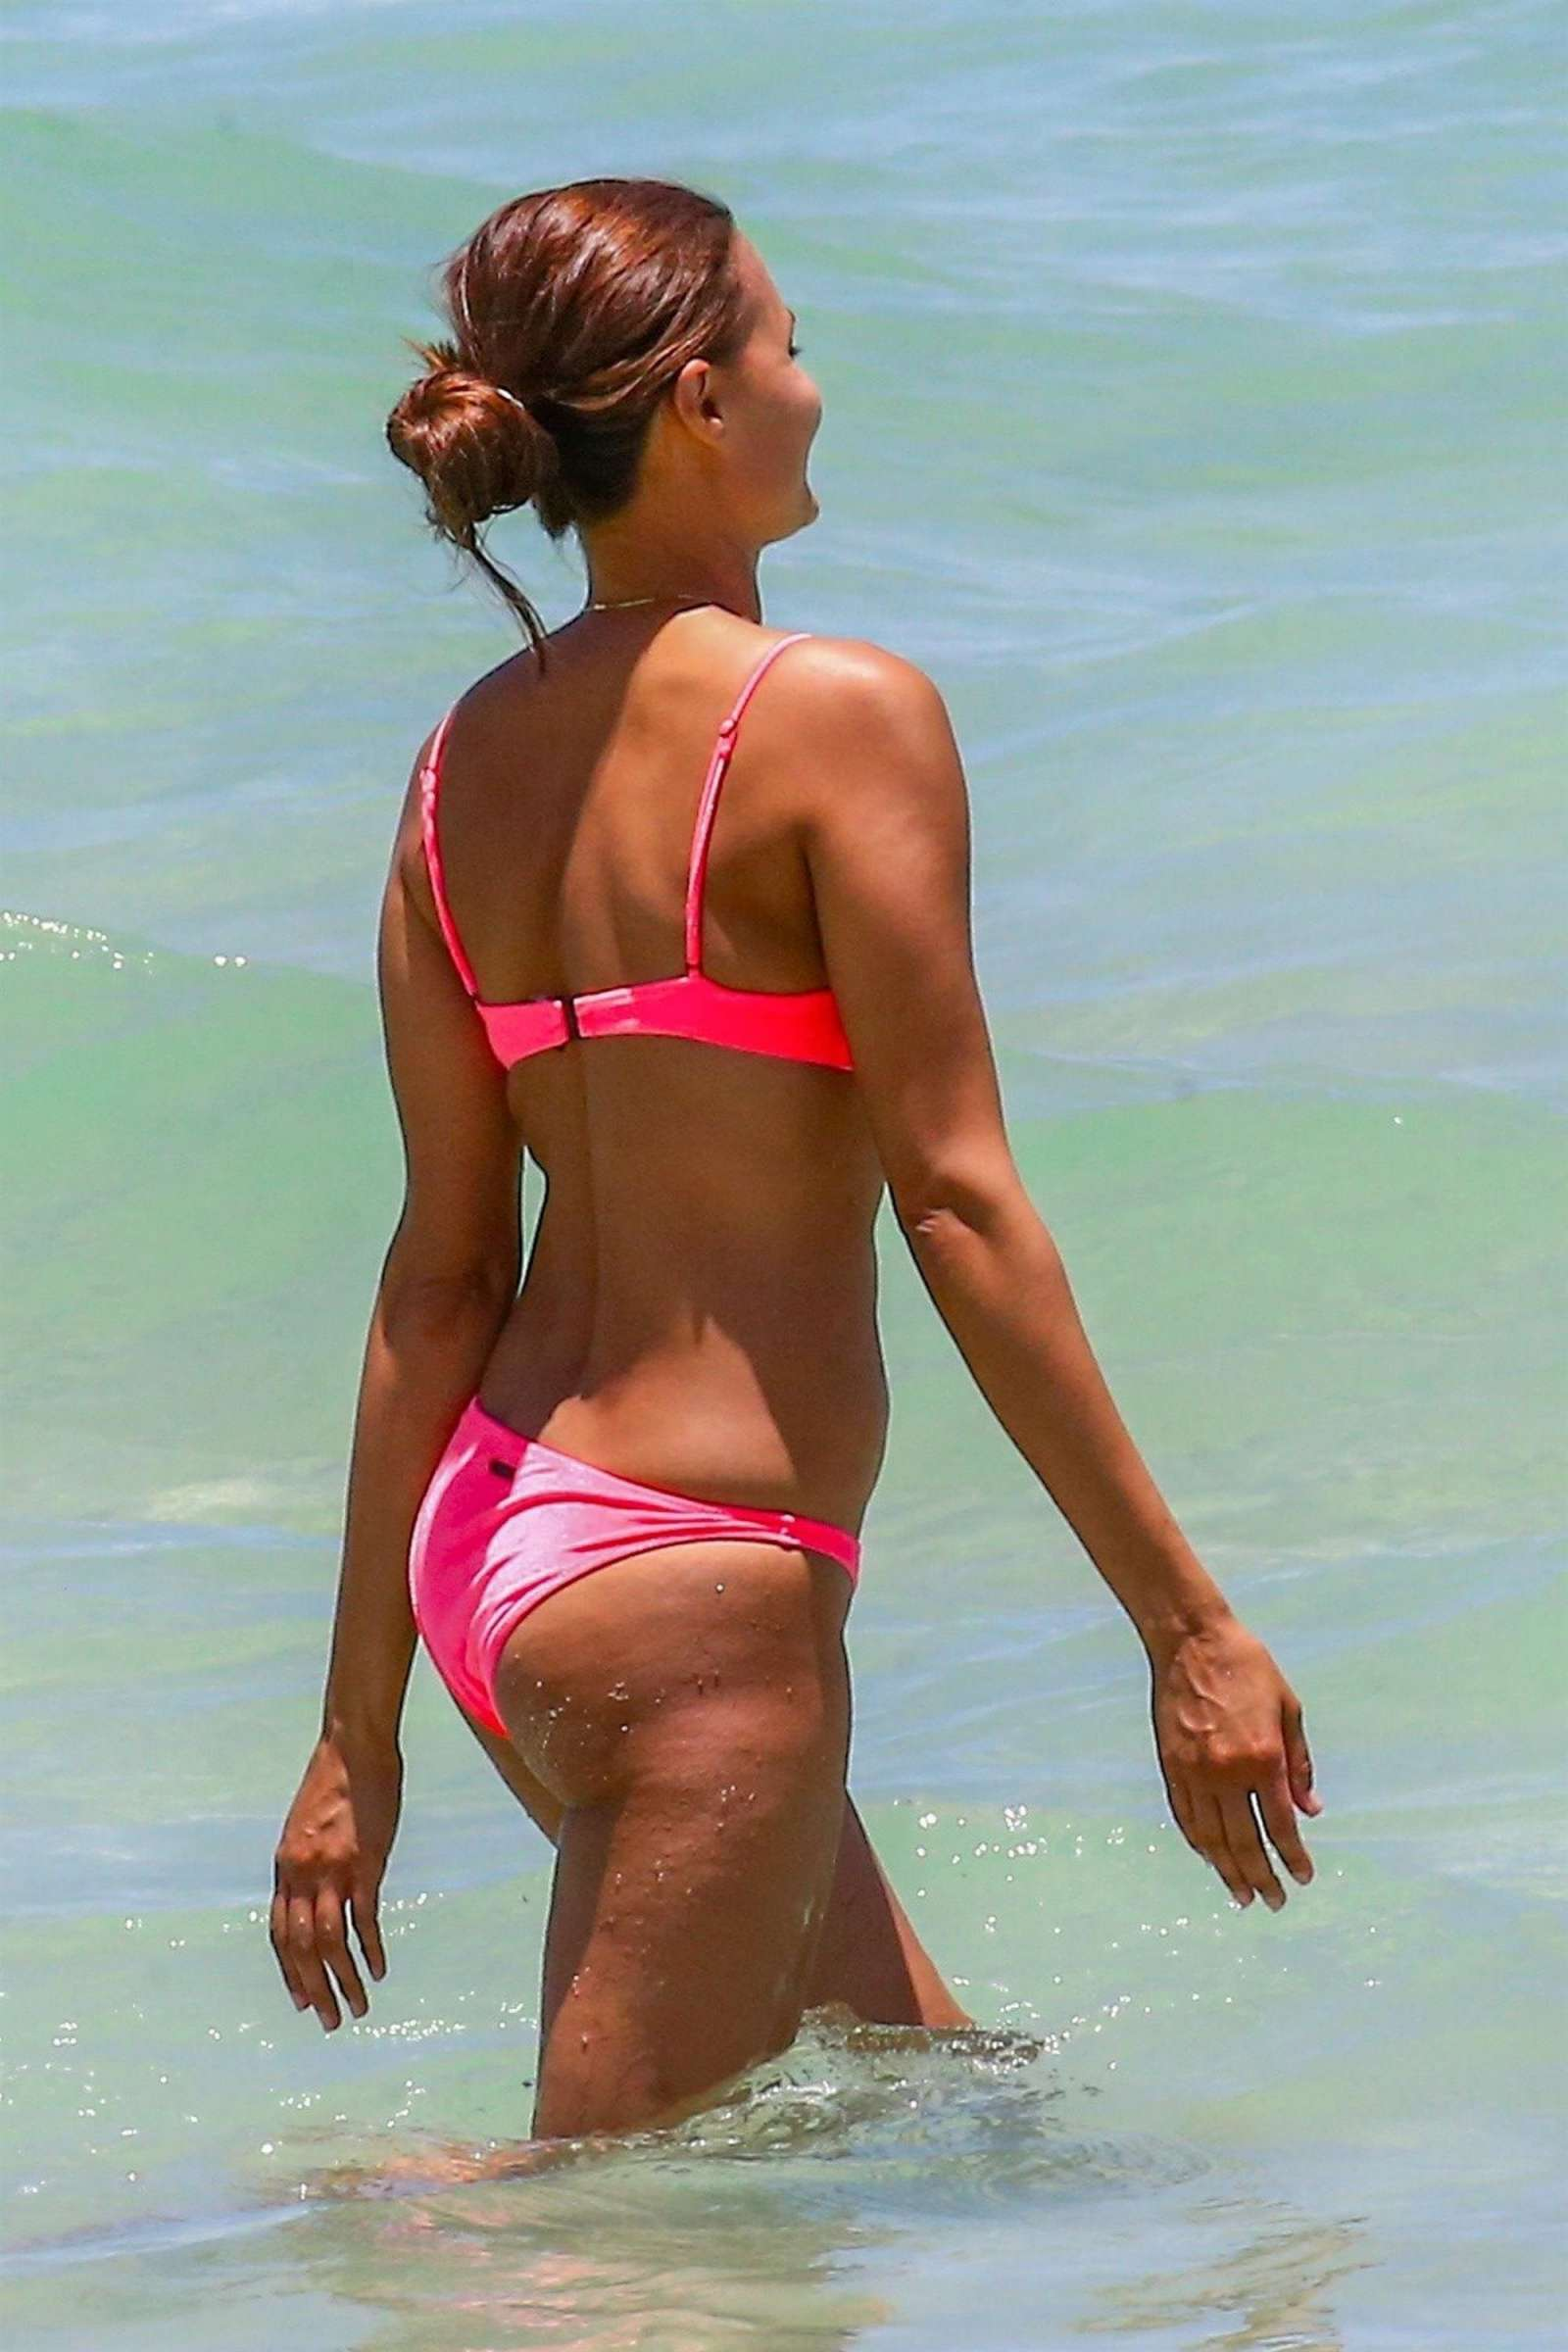 Watch Anne marie kortright in a pink bikini at miami beach video